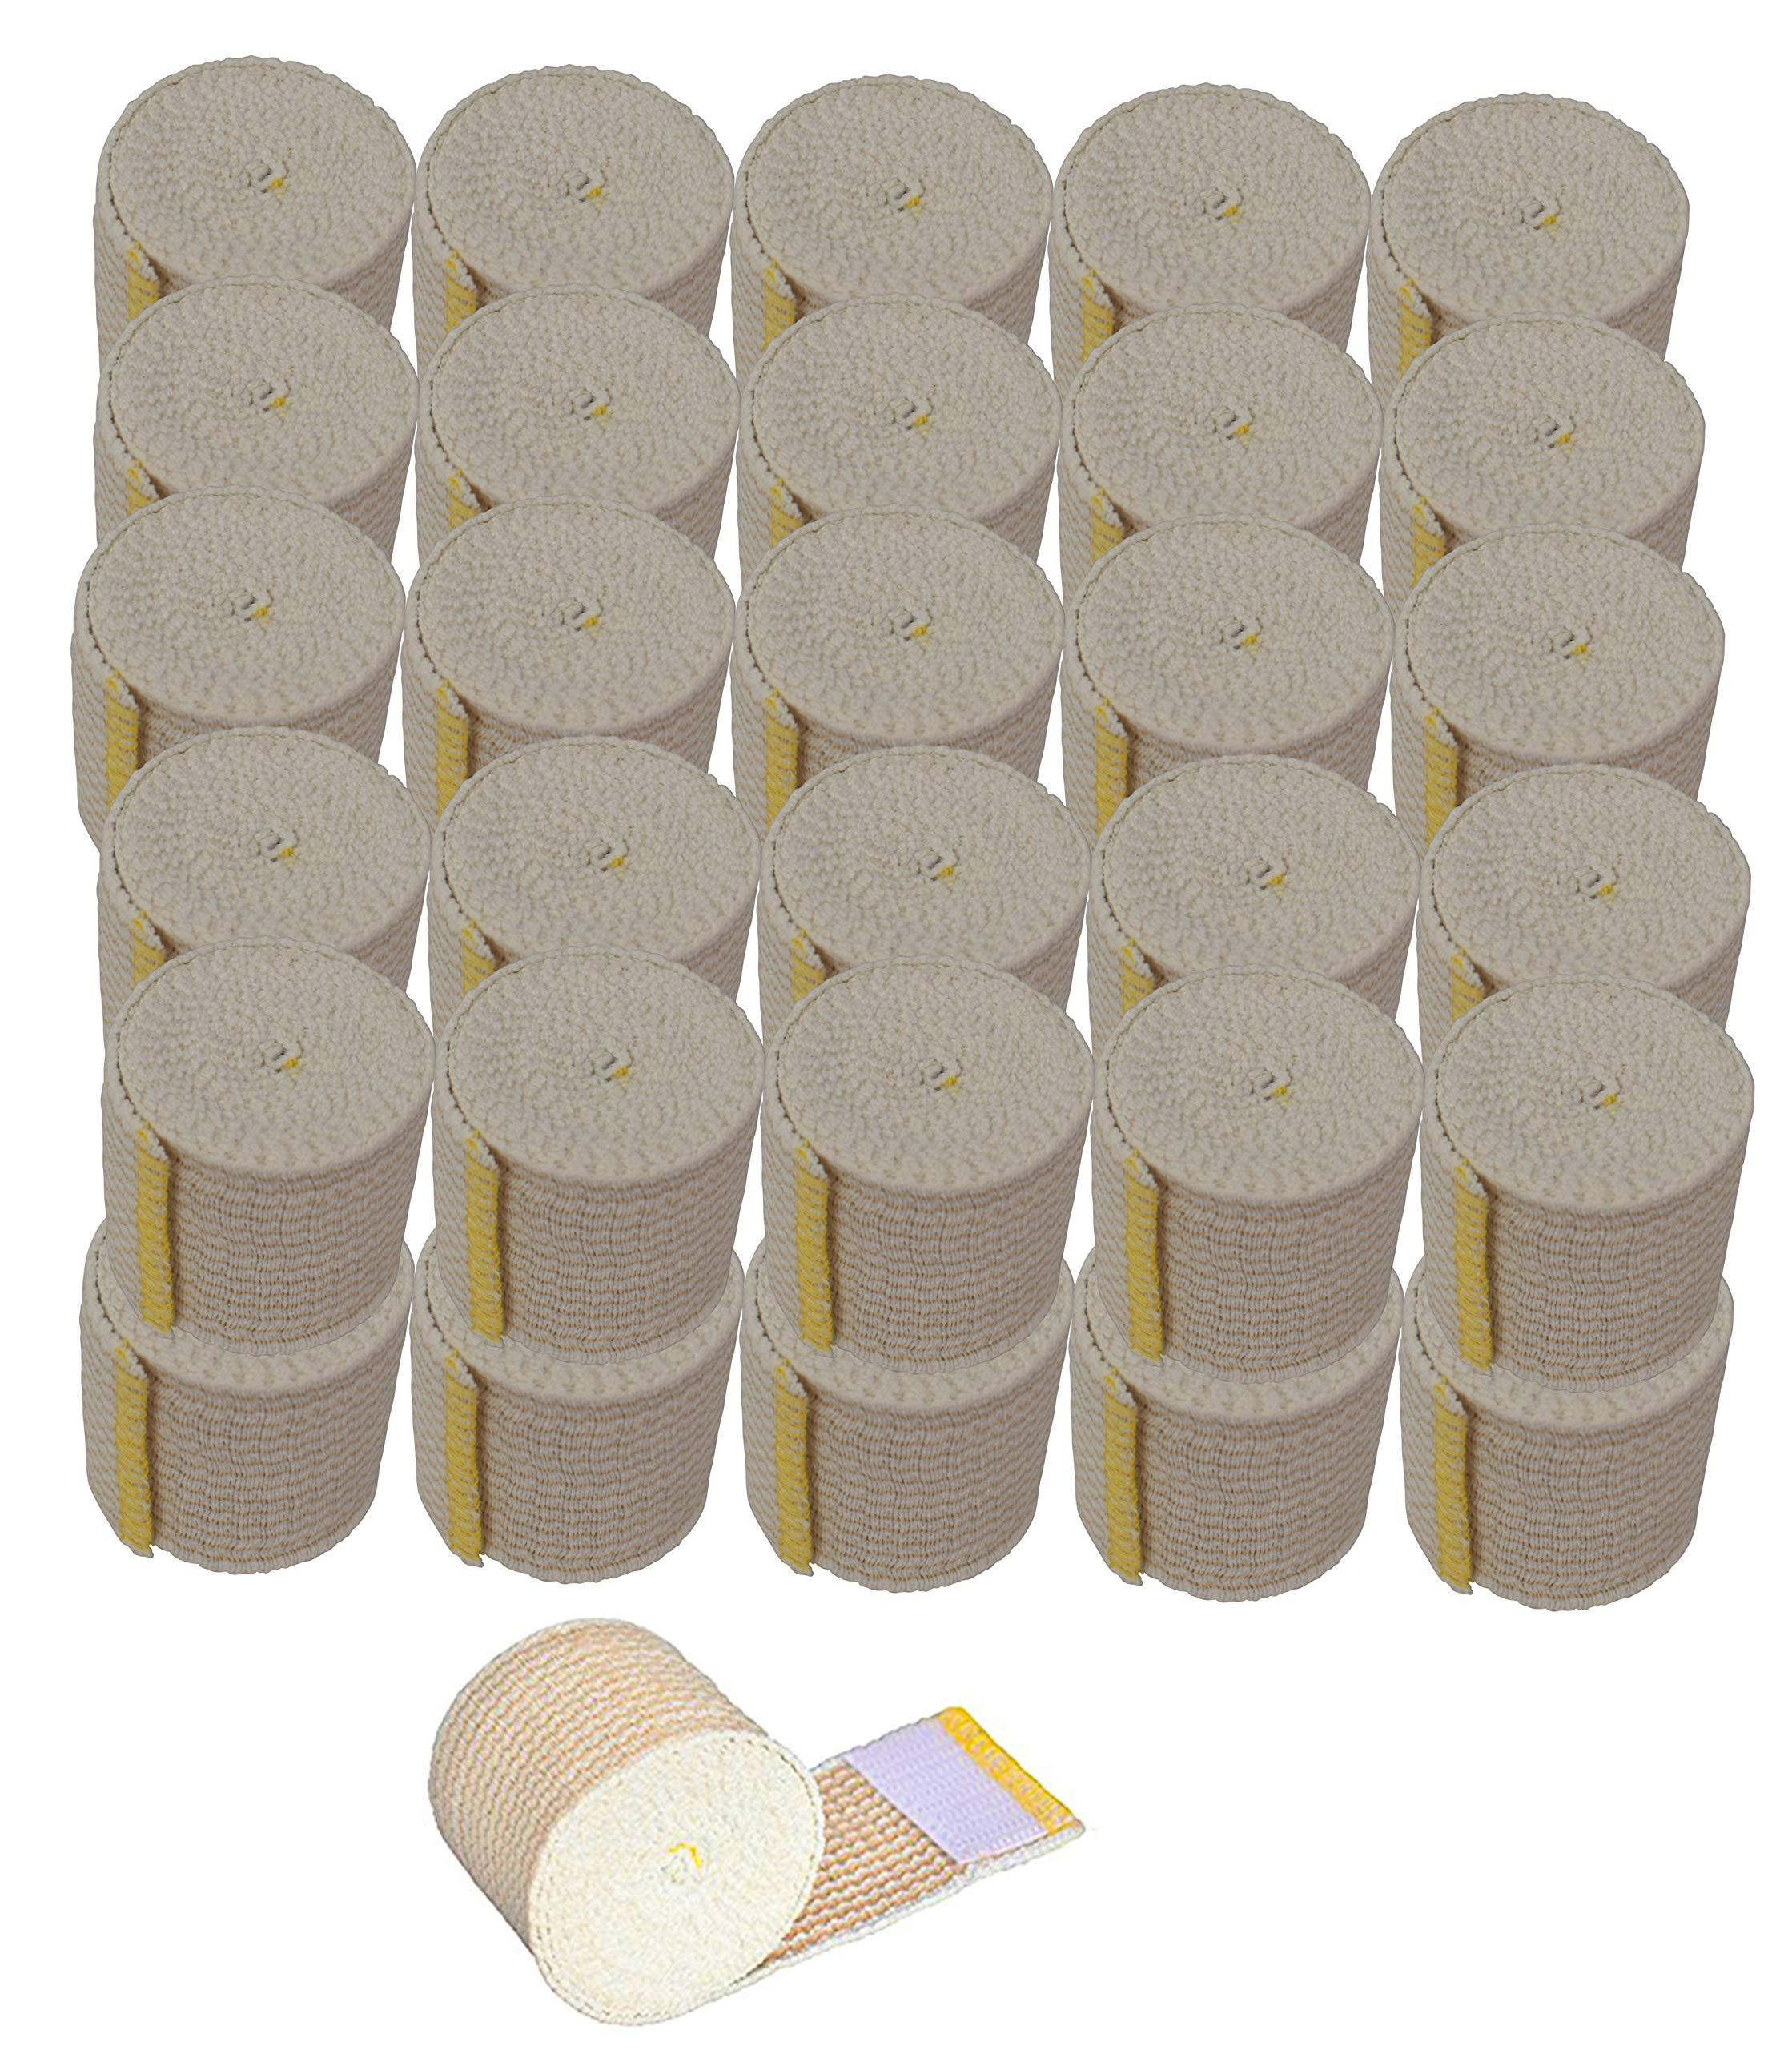 NexSkin Cotton Elastic Bandages w/Hook and Loop Closure, 2'' Width - 50 Bandages